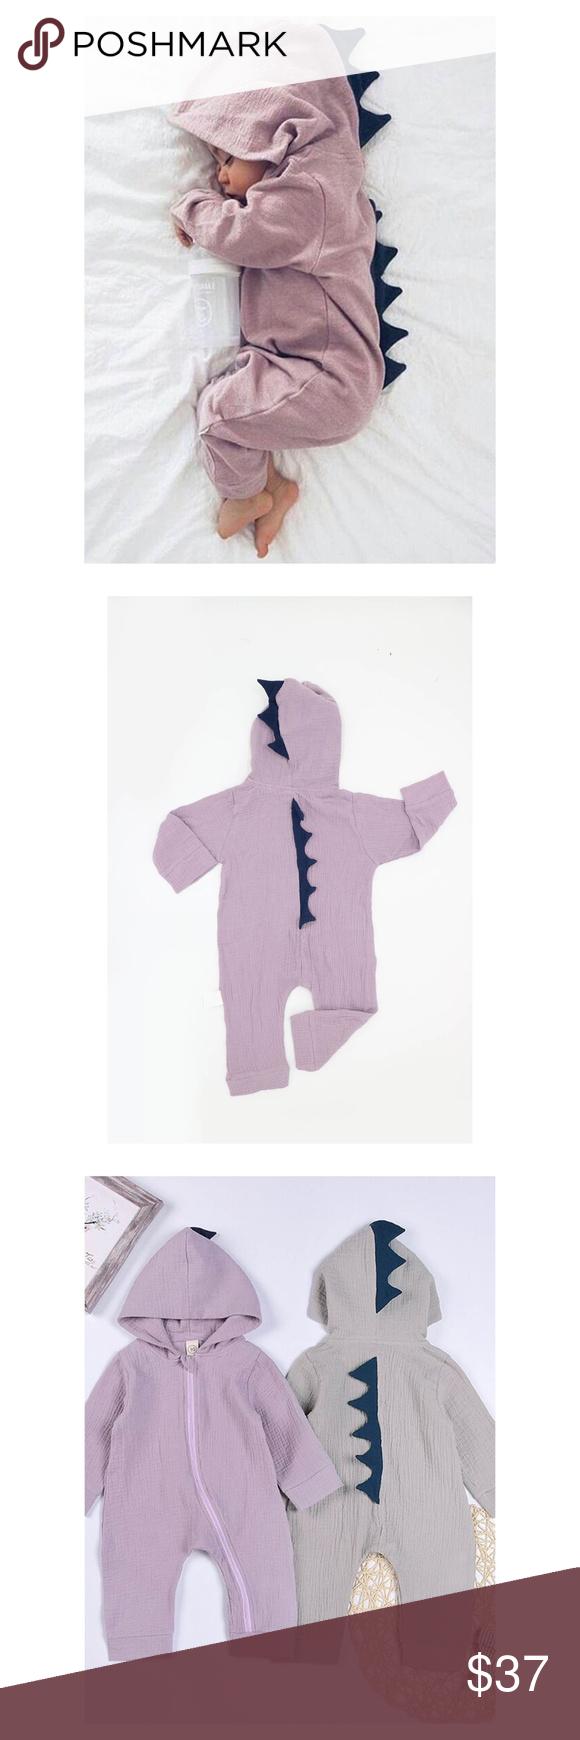 3286e600828 Purple Long Sleeve Dinosaur Jumpsuit Baby Boy Girl Brand  One Rainbow Size   6M Long